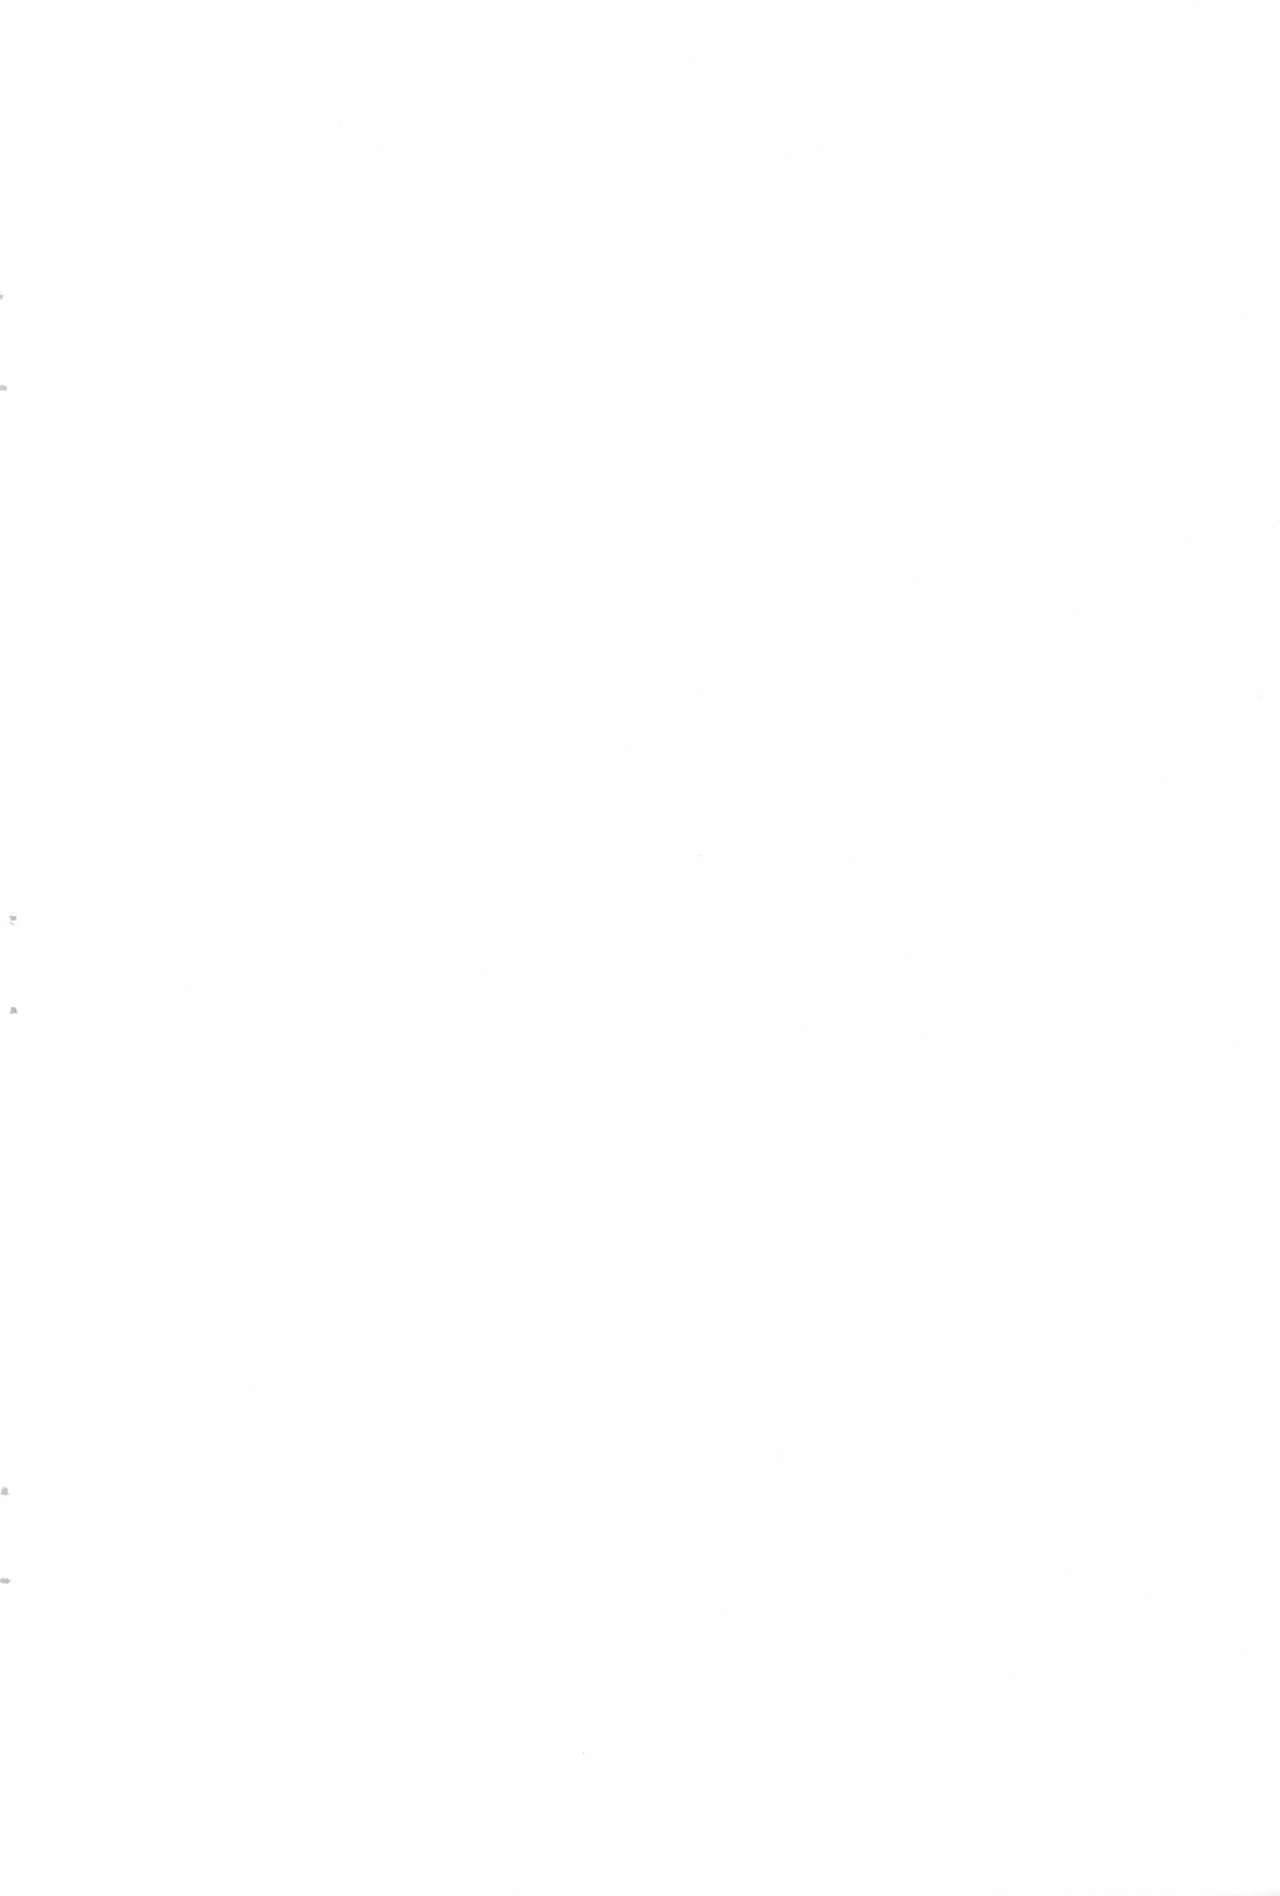 Wancho-ke Note 110529 1